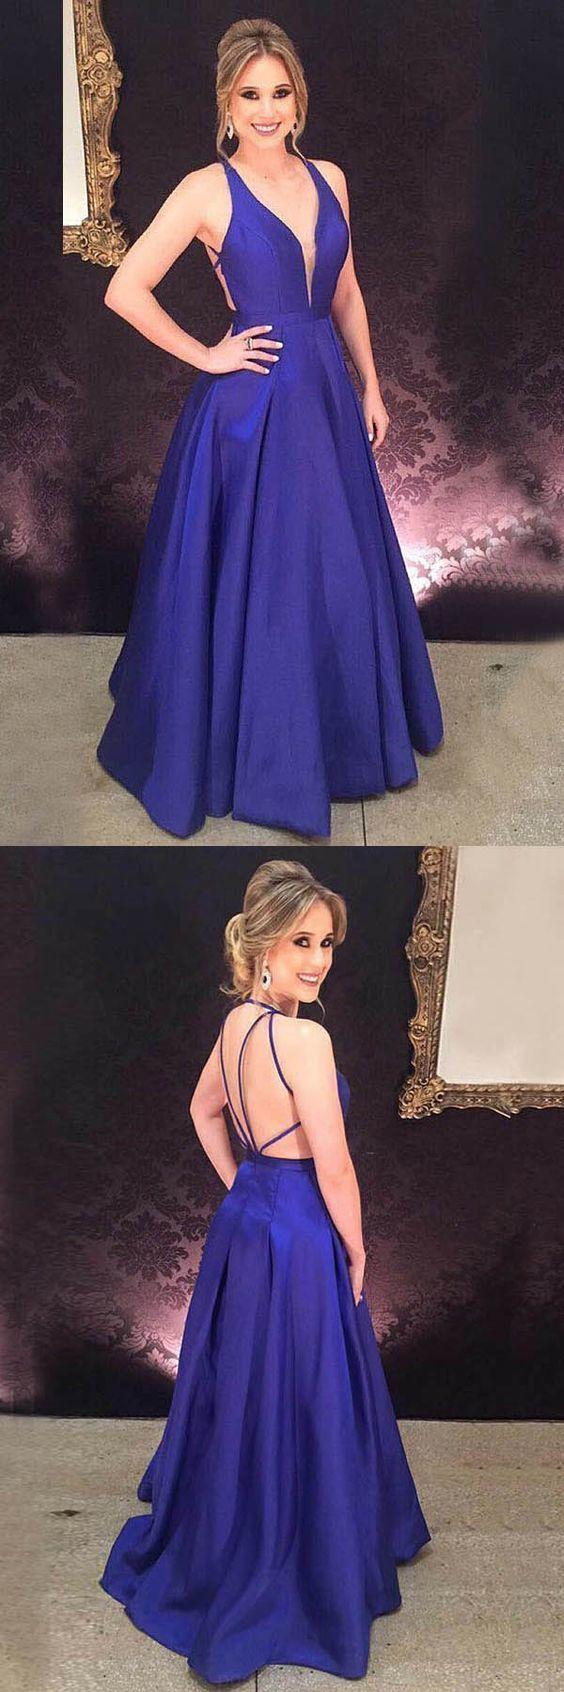 A-Line Deep V-Neck Royal Blue Satin Pleats Prom Evening Dress 0838